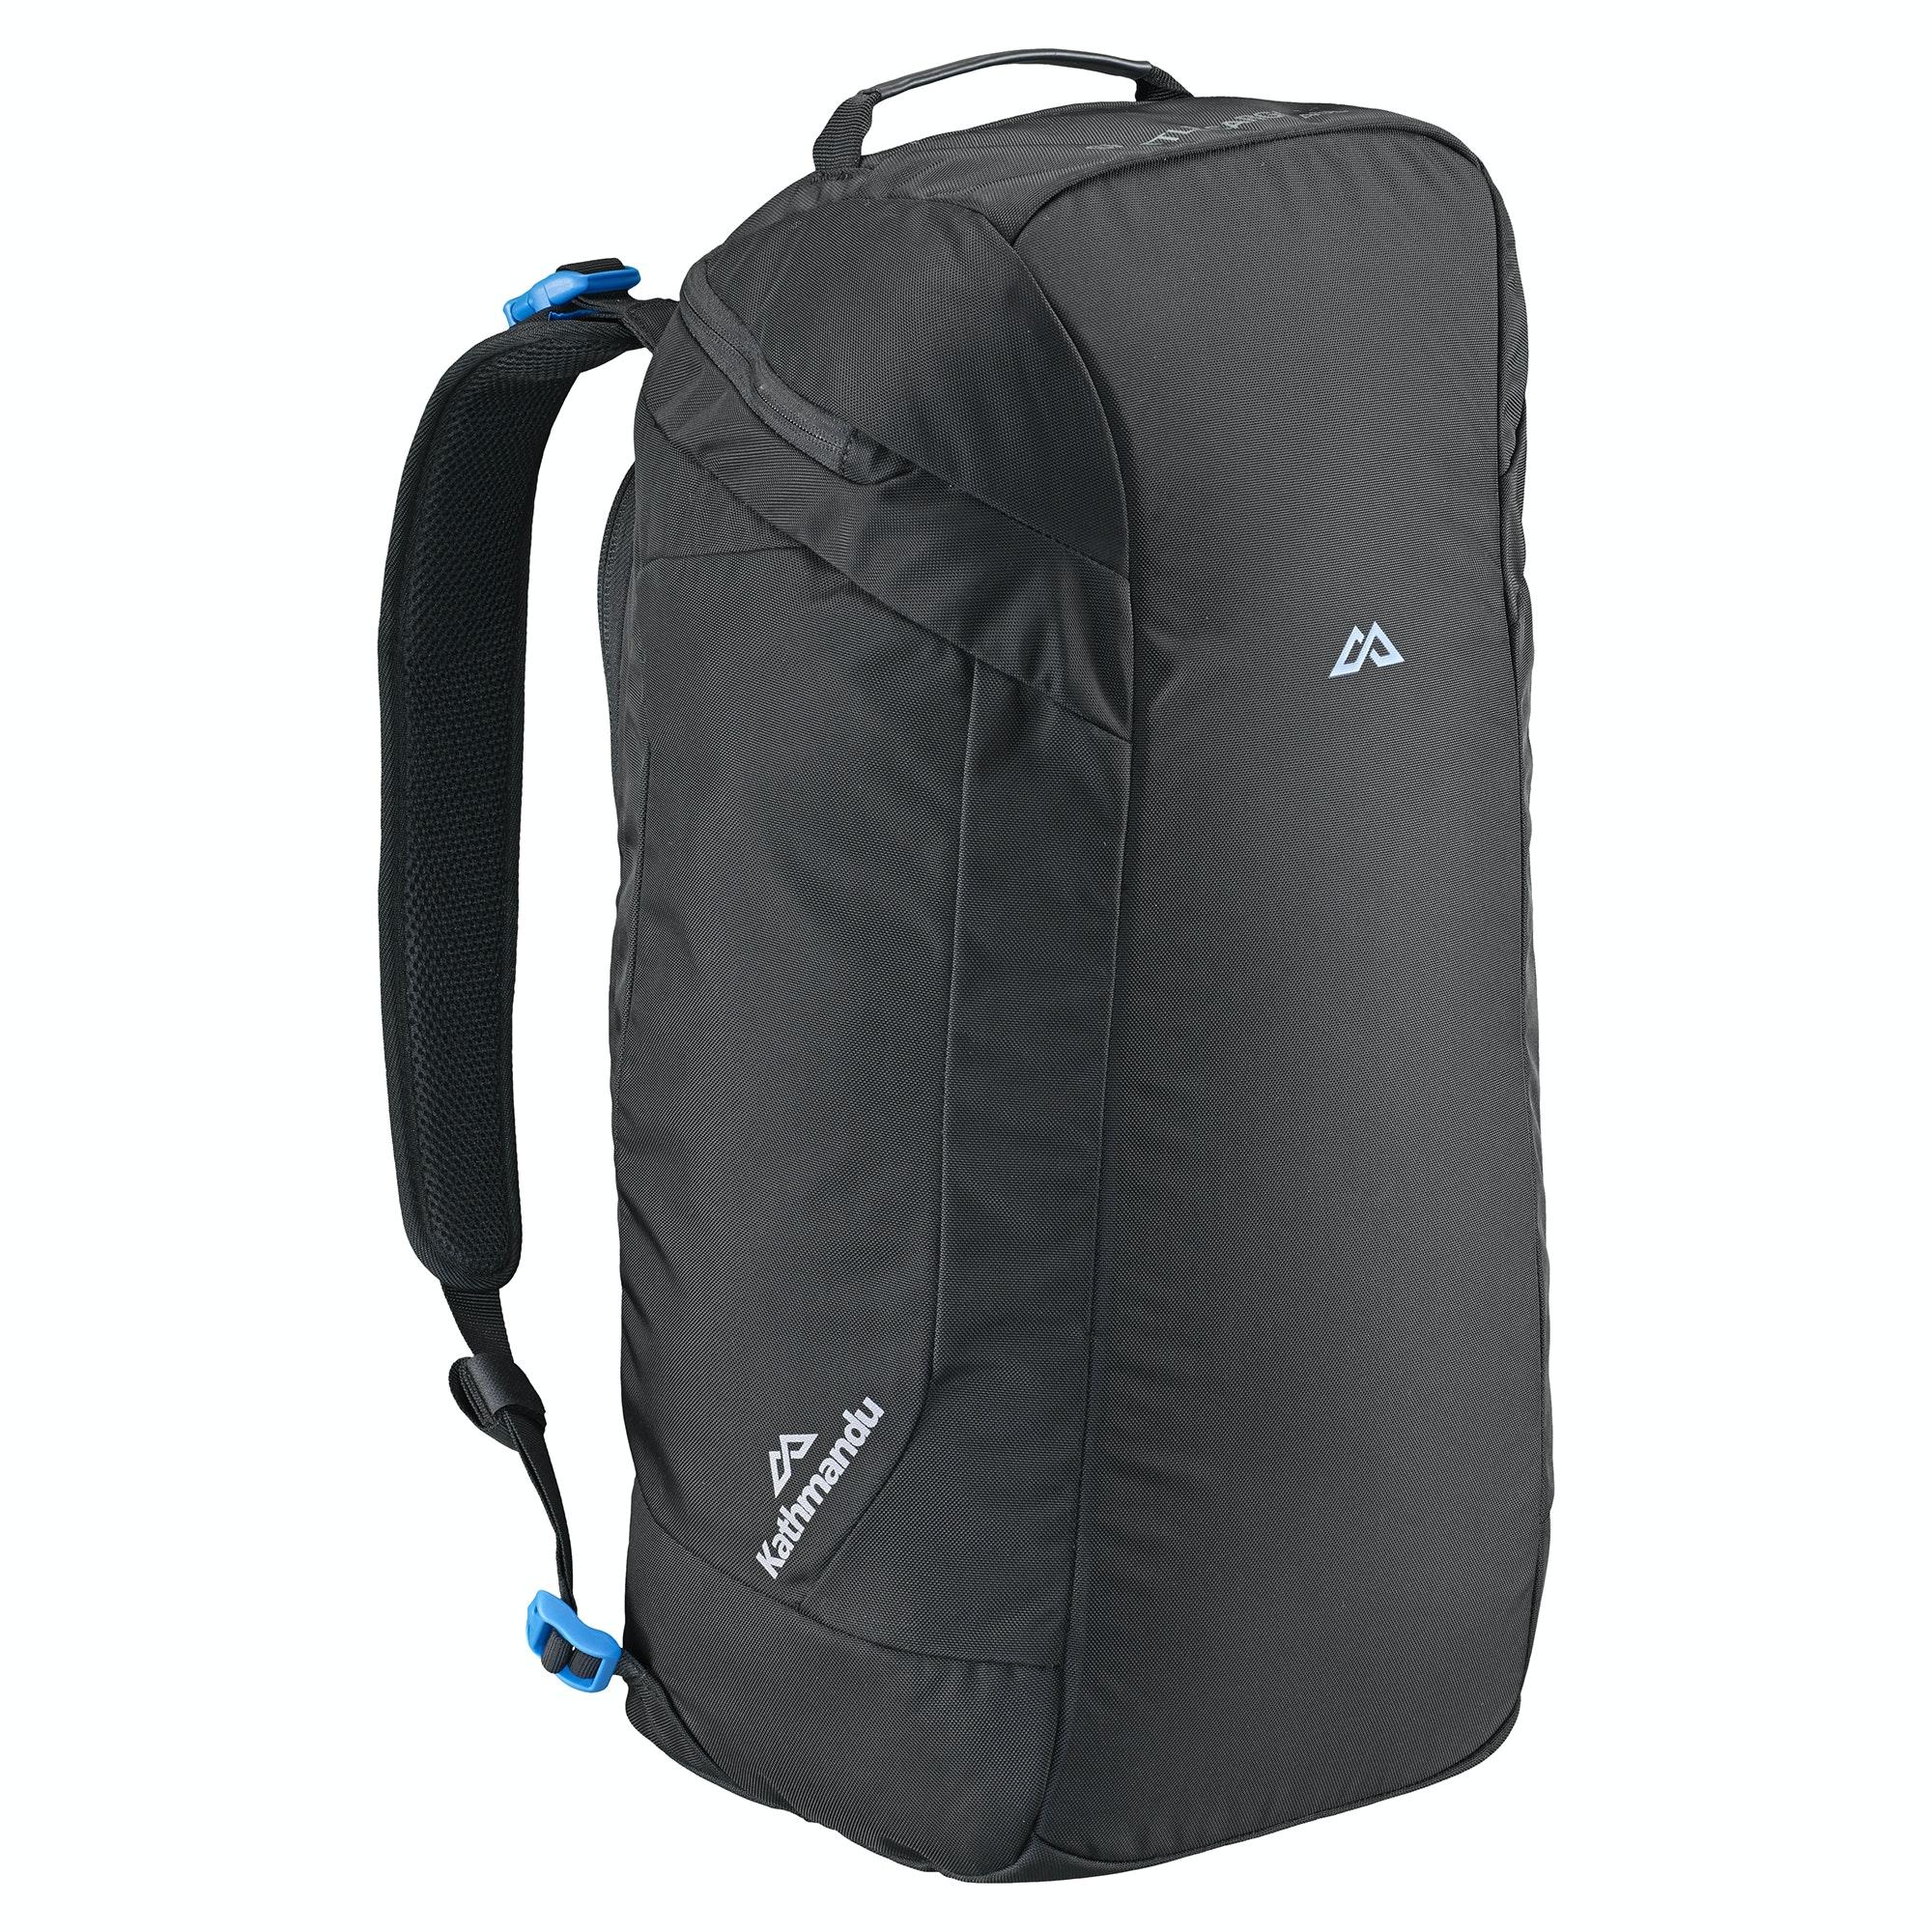 NEW Kathmandu Shuttle Convertible Travel Backpack Duffle Cargo Bag ... 7ba3a2563d62f